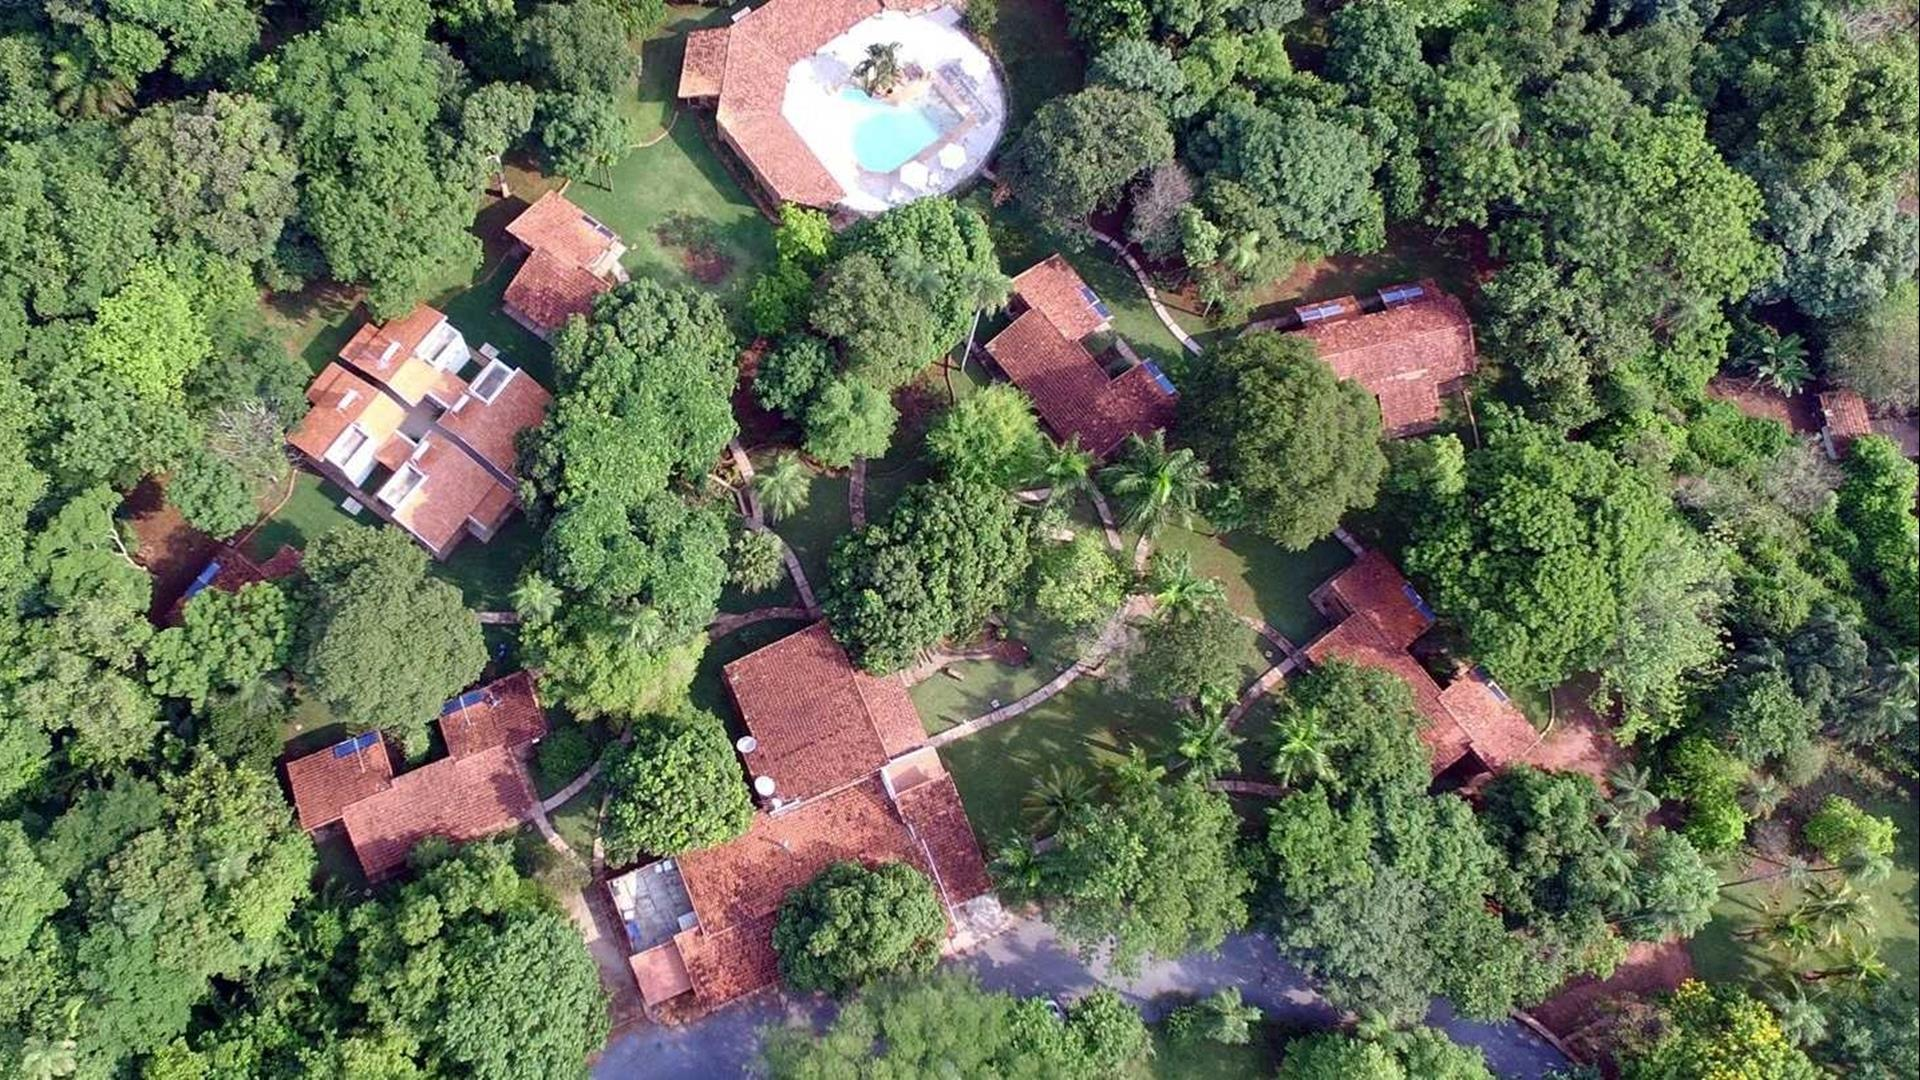 Brasilien Bonito: Landestypische Unterkunft - Pousada Olho d' Agua